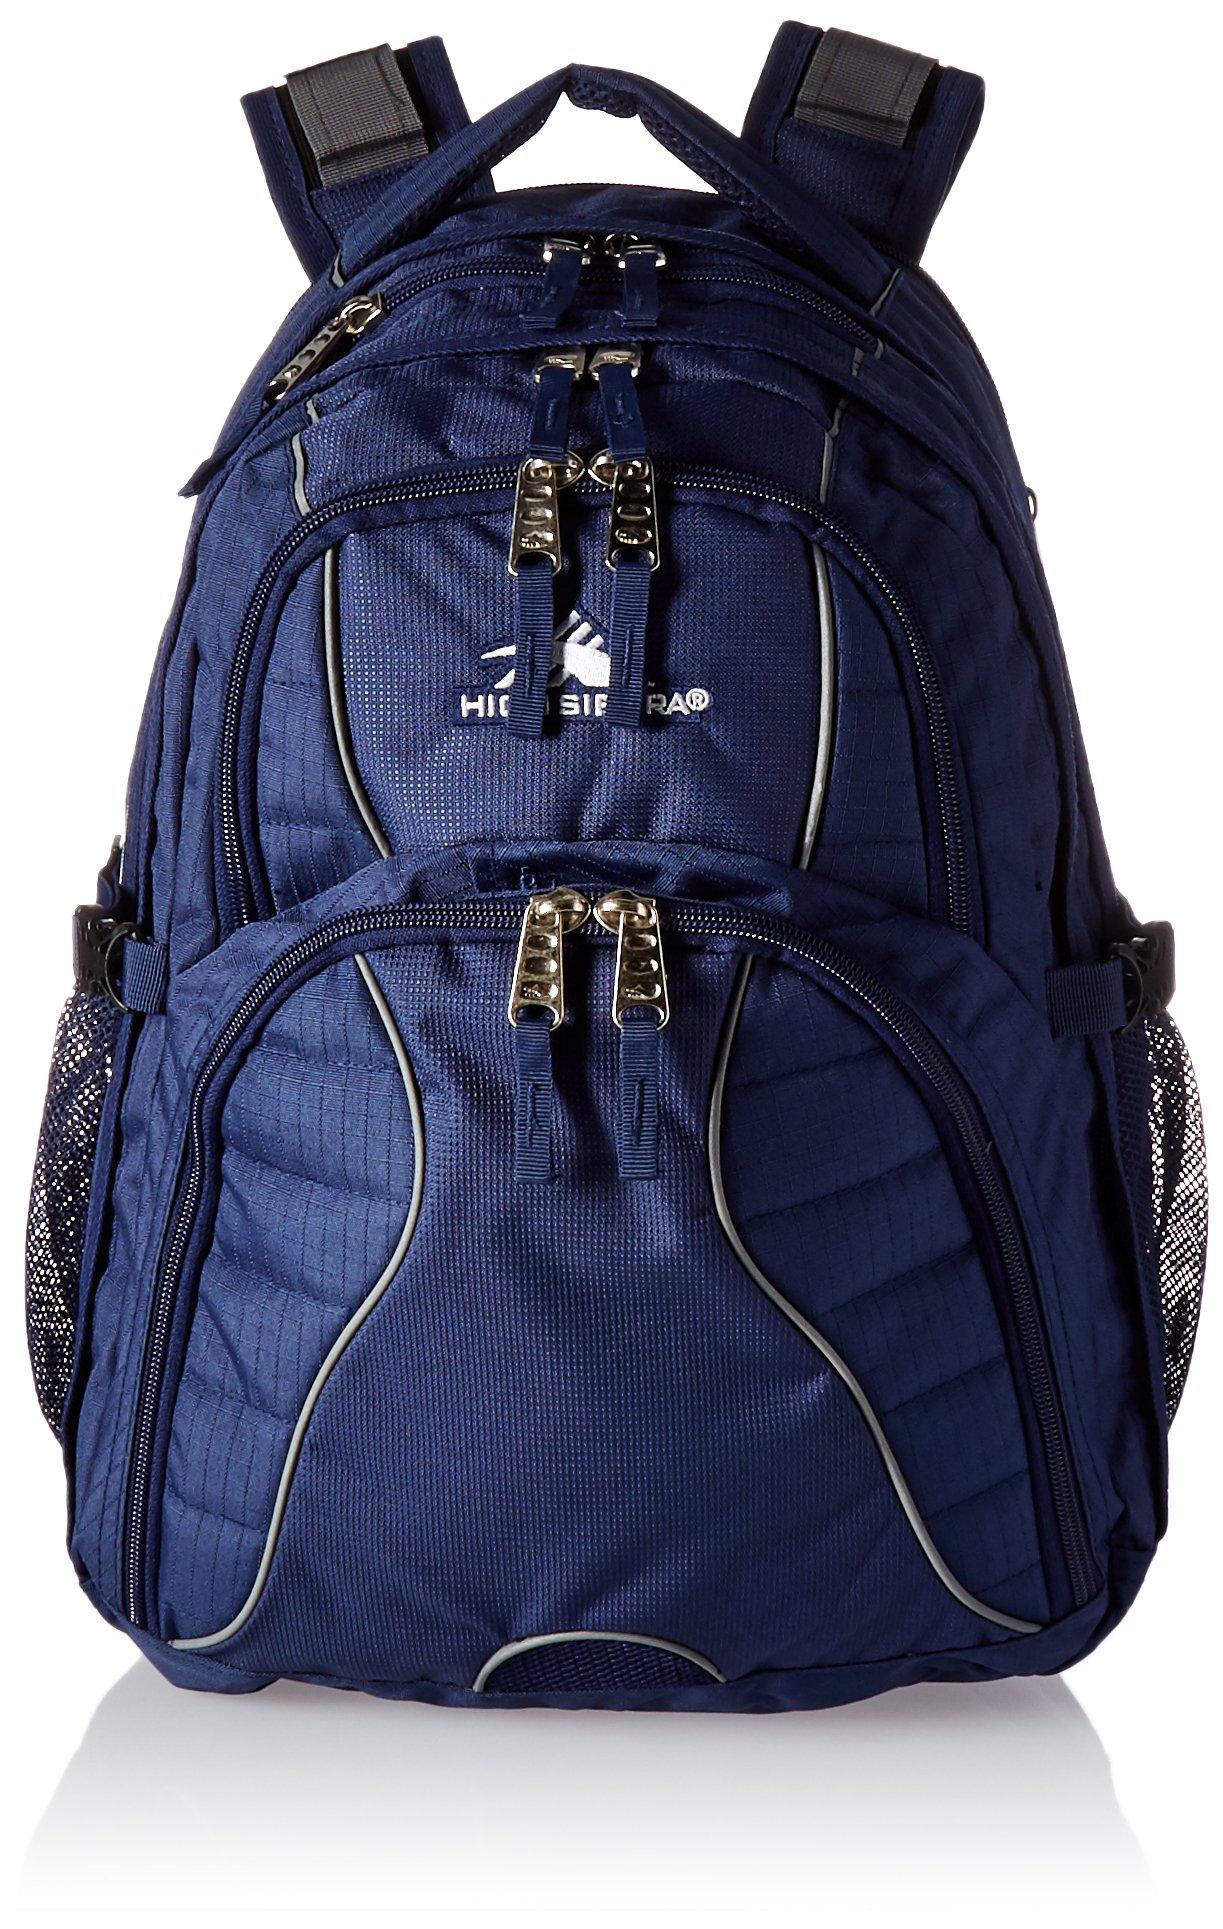 daf8de124f59 Swissgear Travel Gear 1900 Scansmart Tsa Laptop Business And Laptop Backpack  New